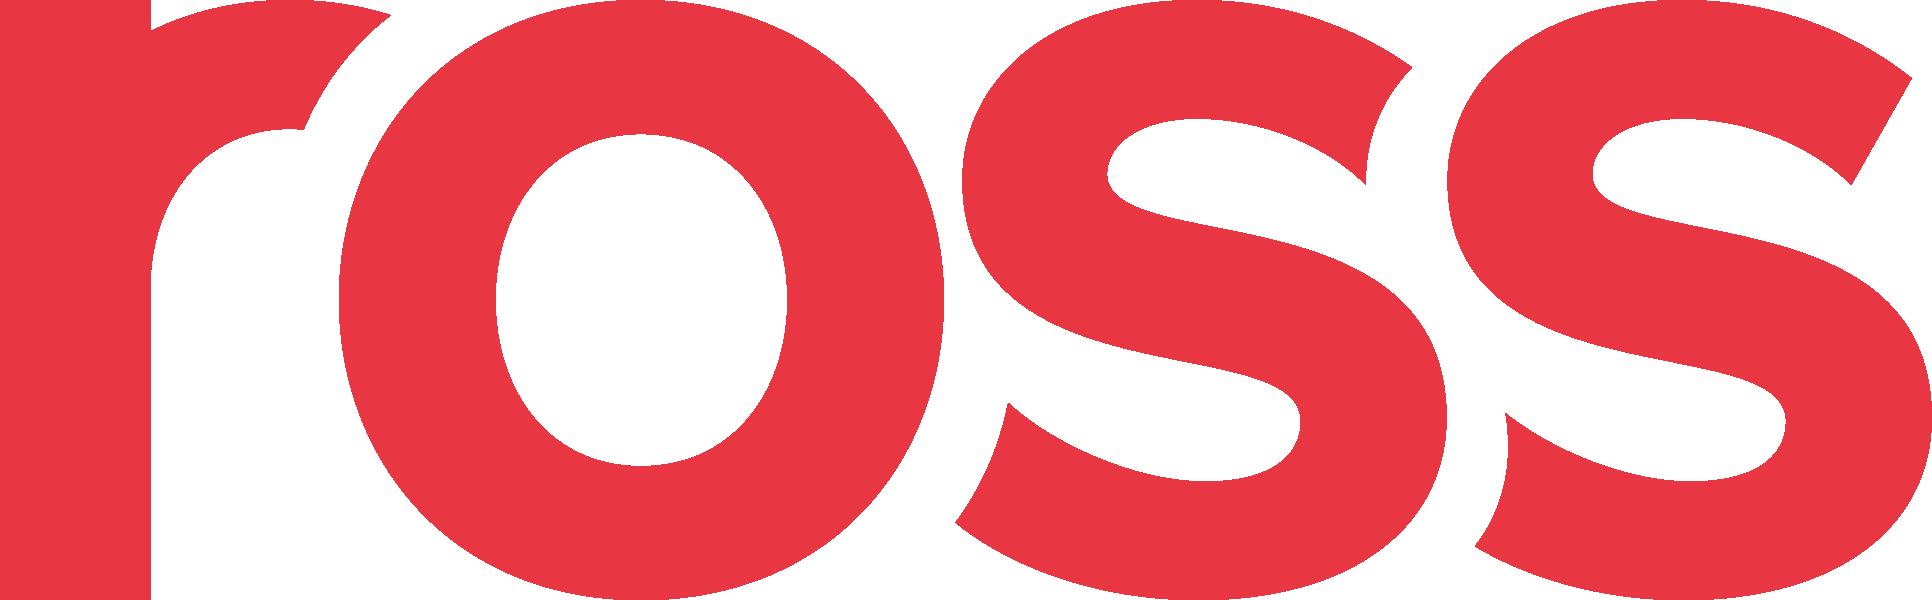 Read ROSS Castors Reviews